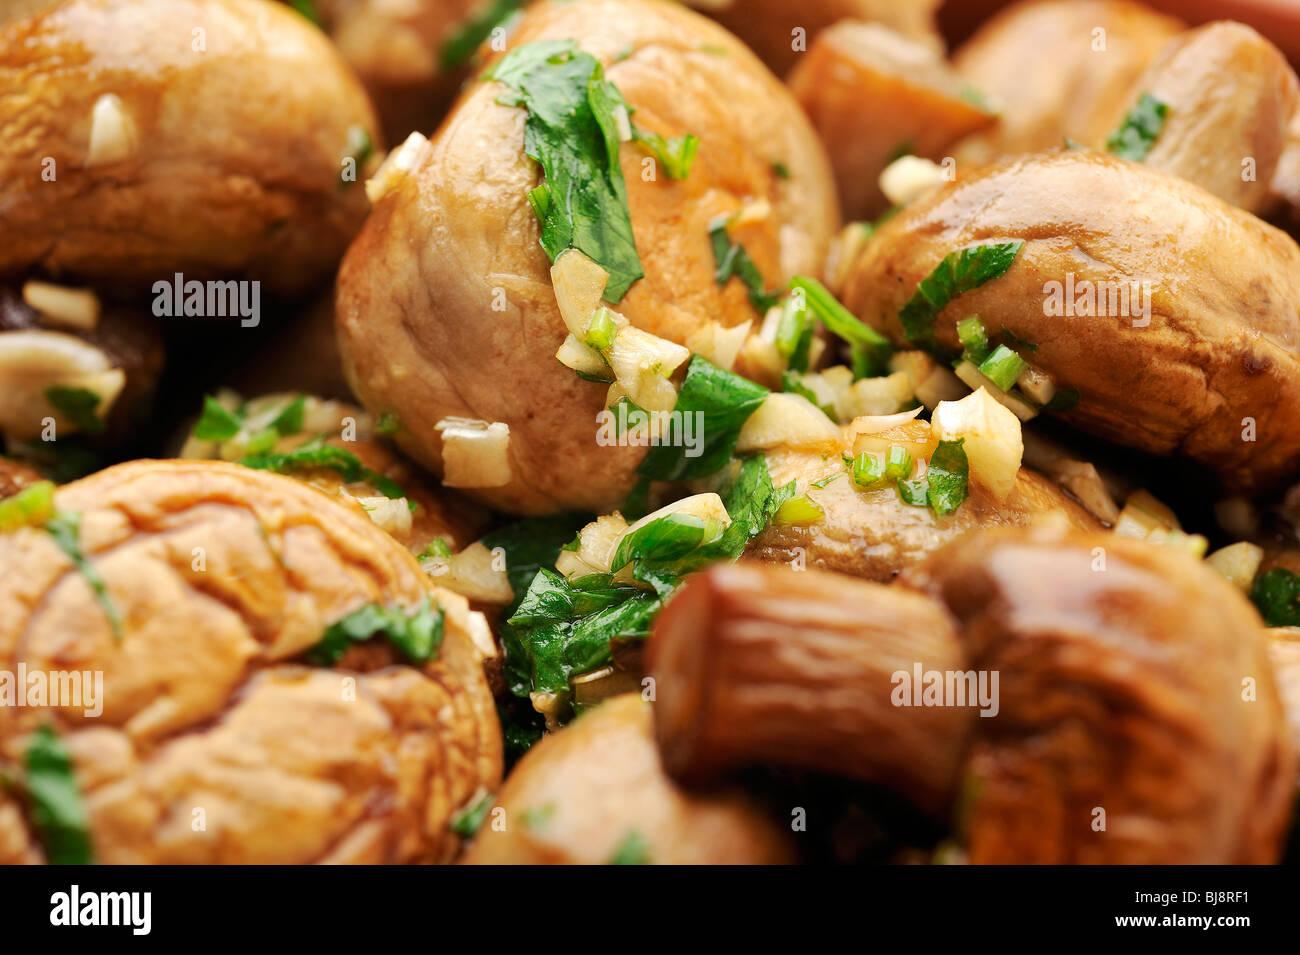 Sauteed Mushrooms With Garlic & Parsley Recipes — Dishmaps